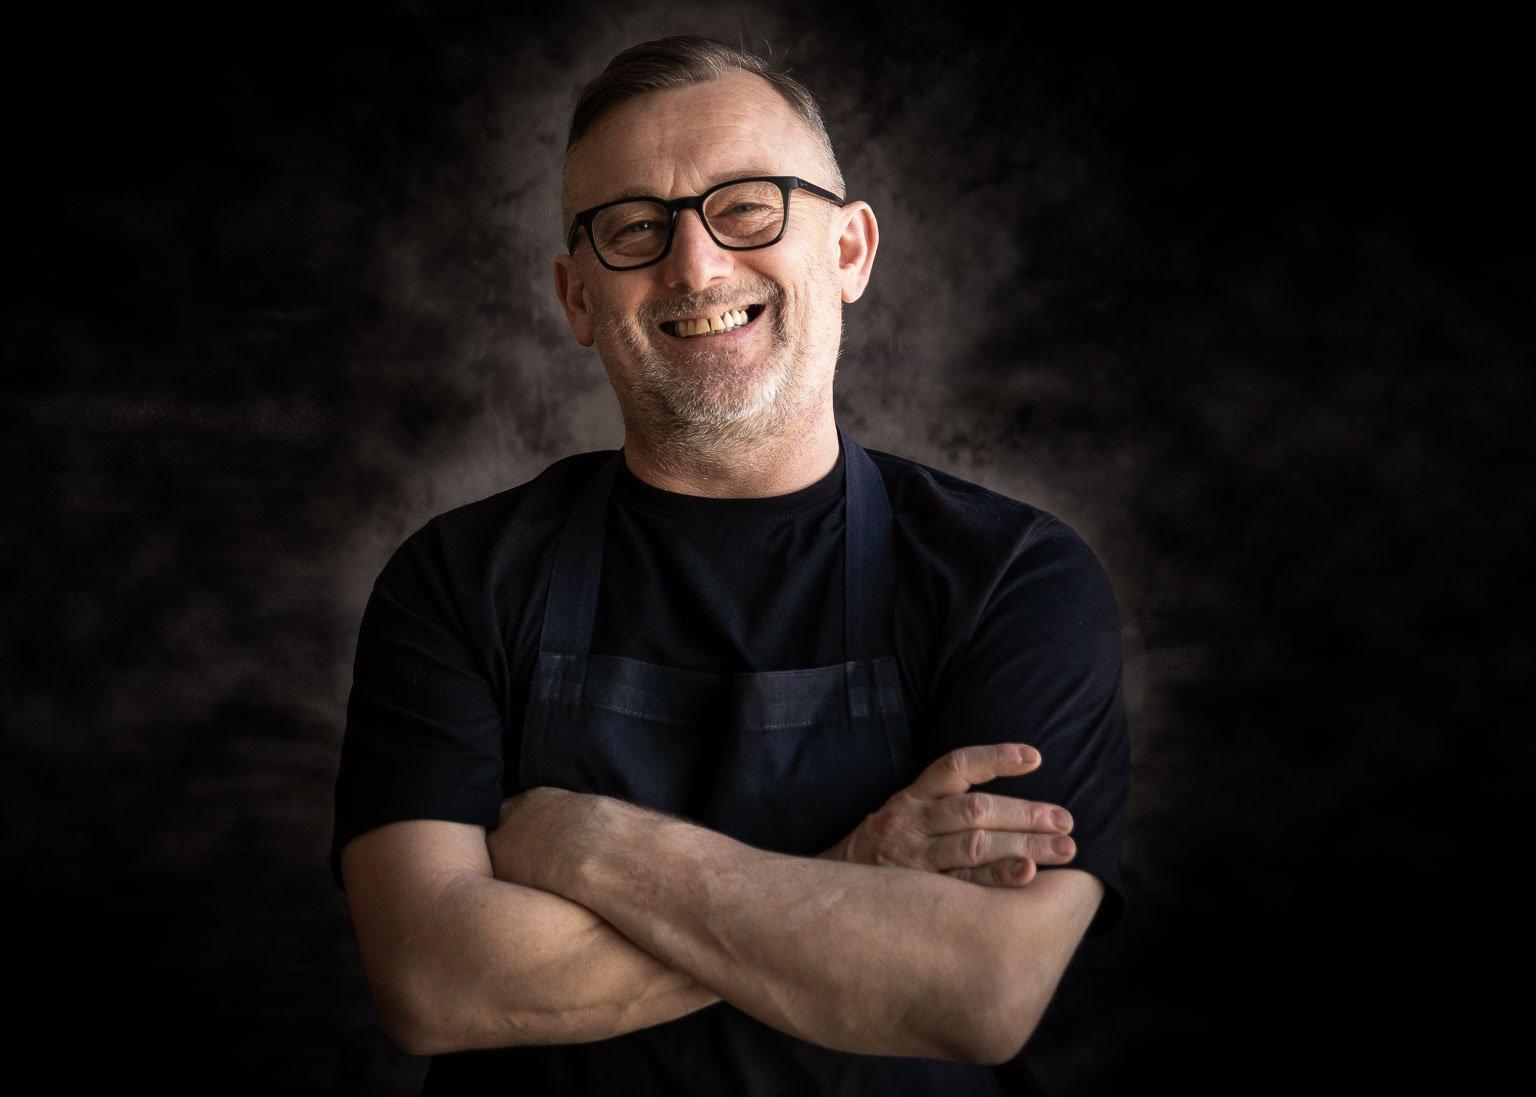 Chef patron Simon Shaw of El Gato Negro